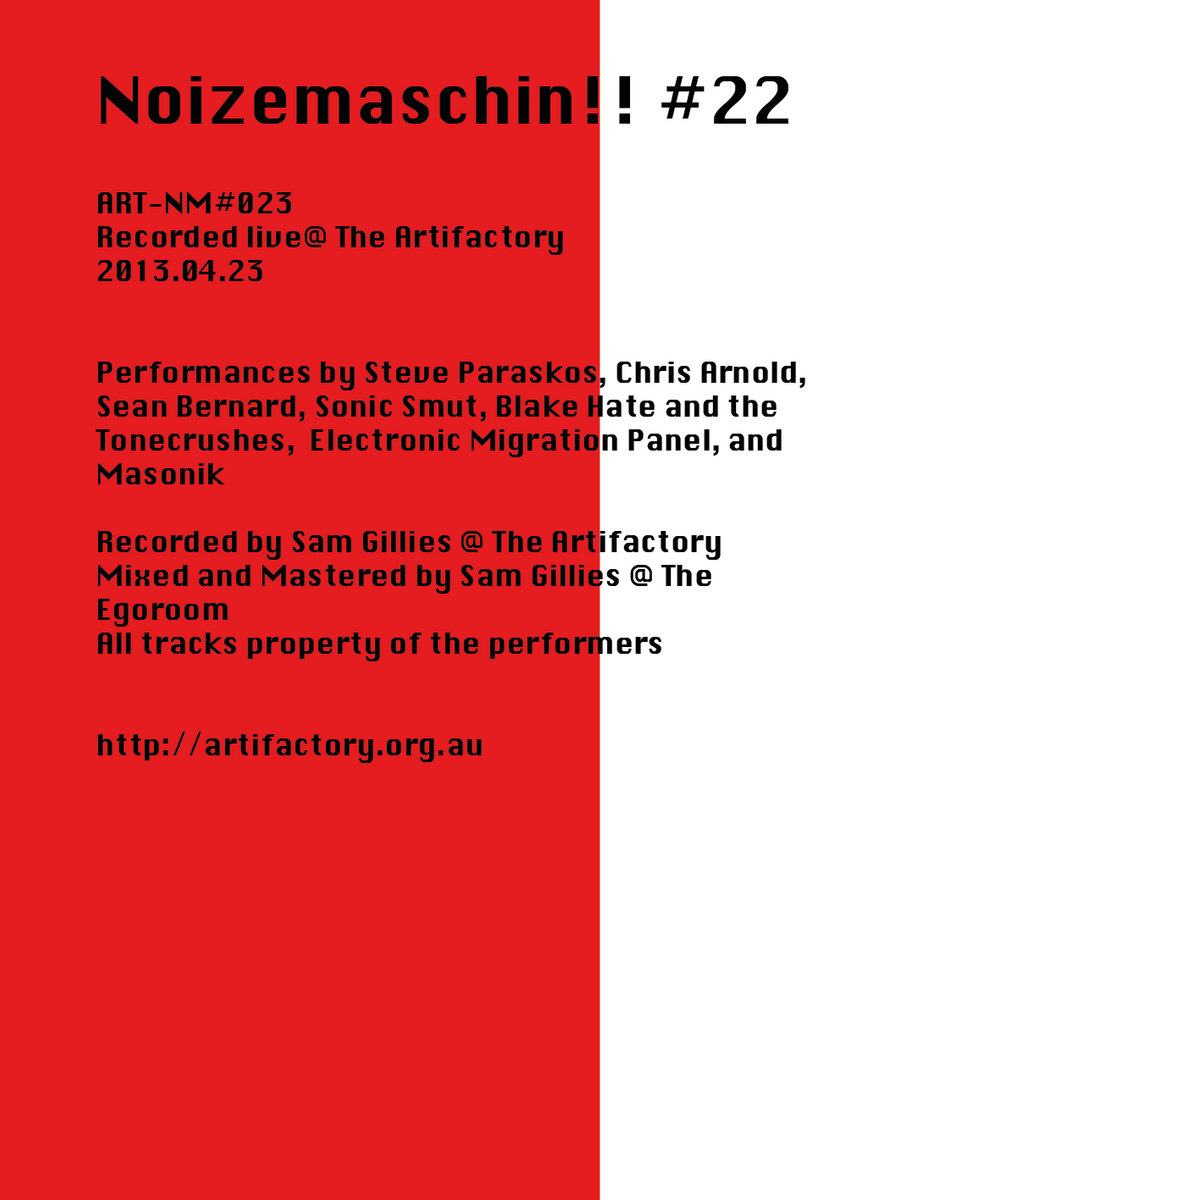 Horse Migration Charts | Noizemaschin!!